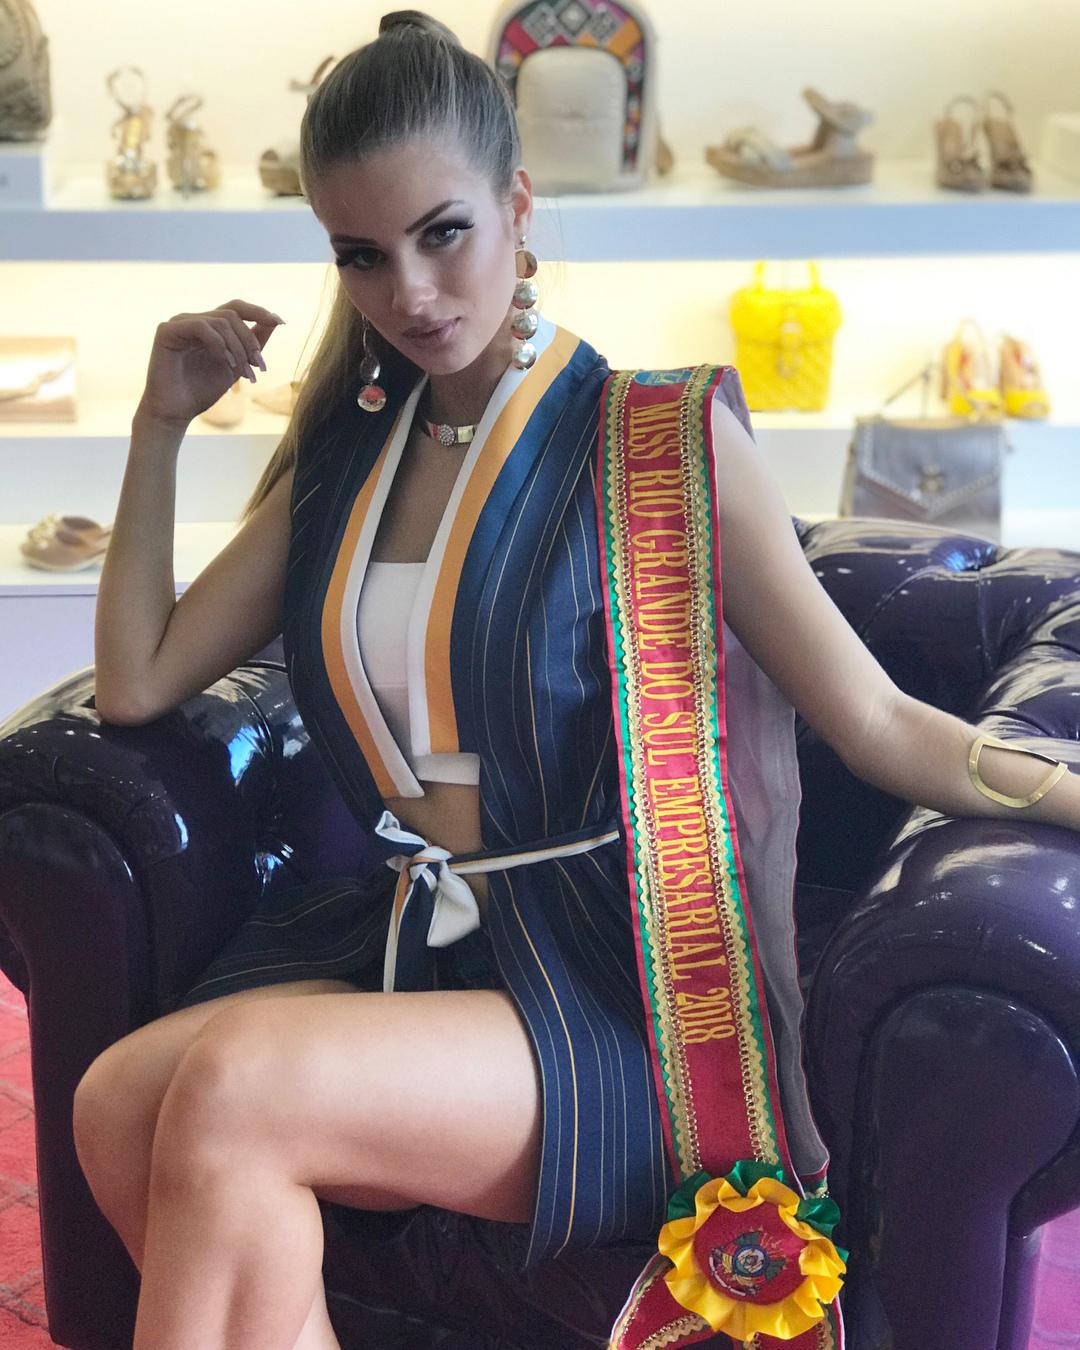 gabriela palma, miss brasil empresarial 2018. - Página 4 38153510